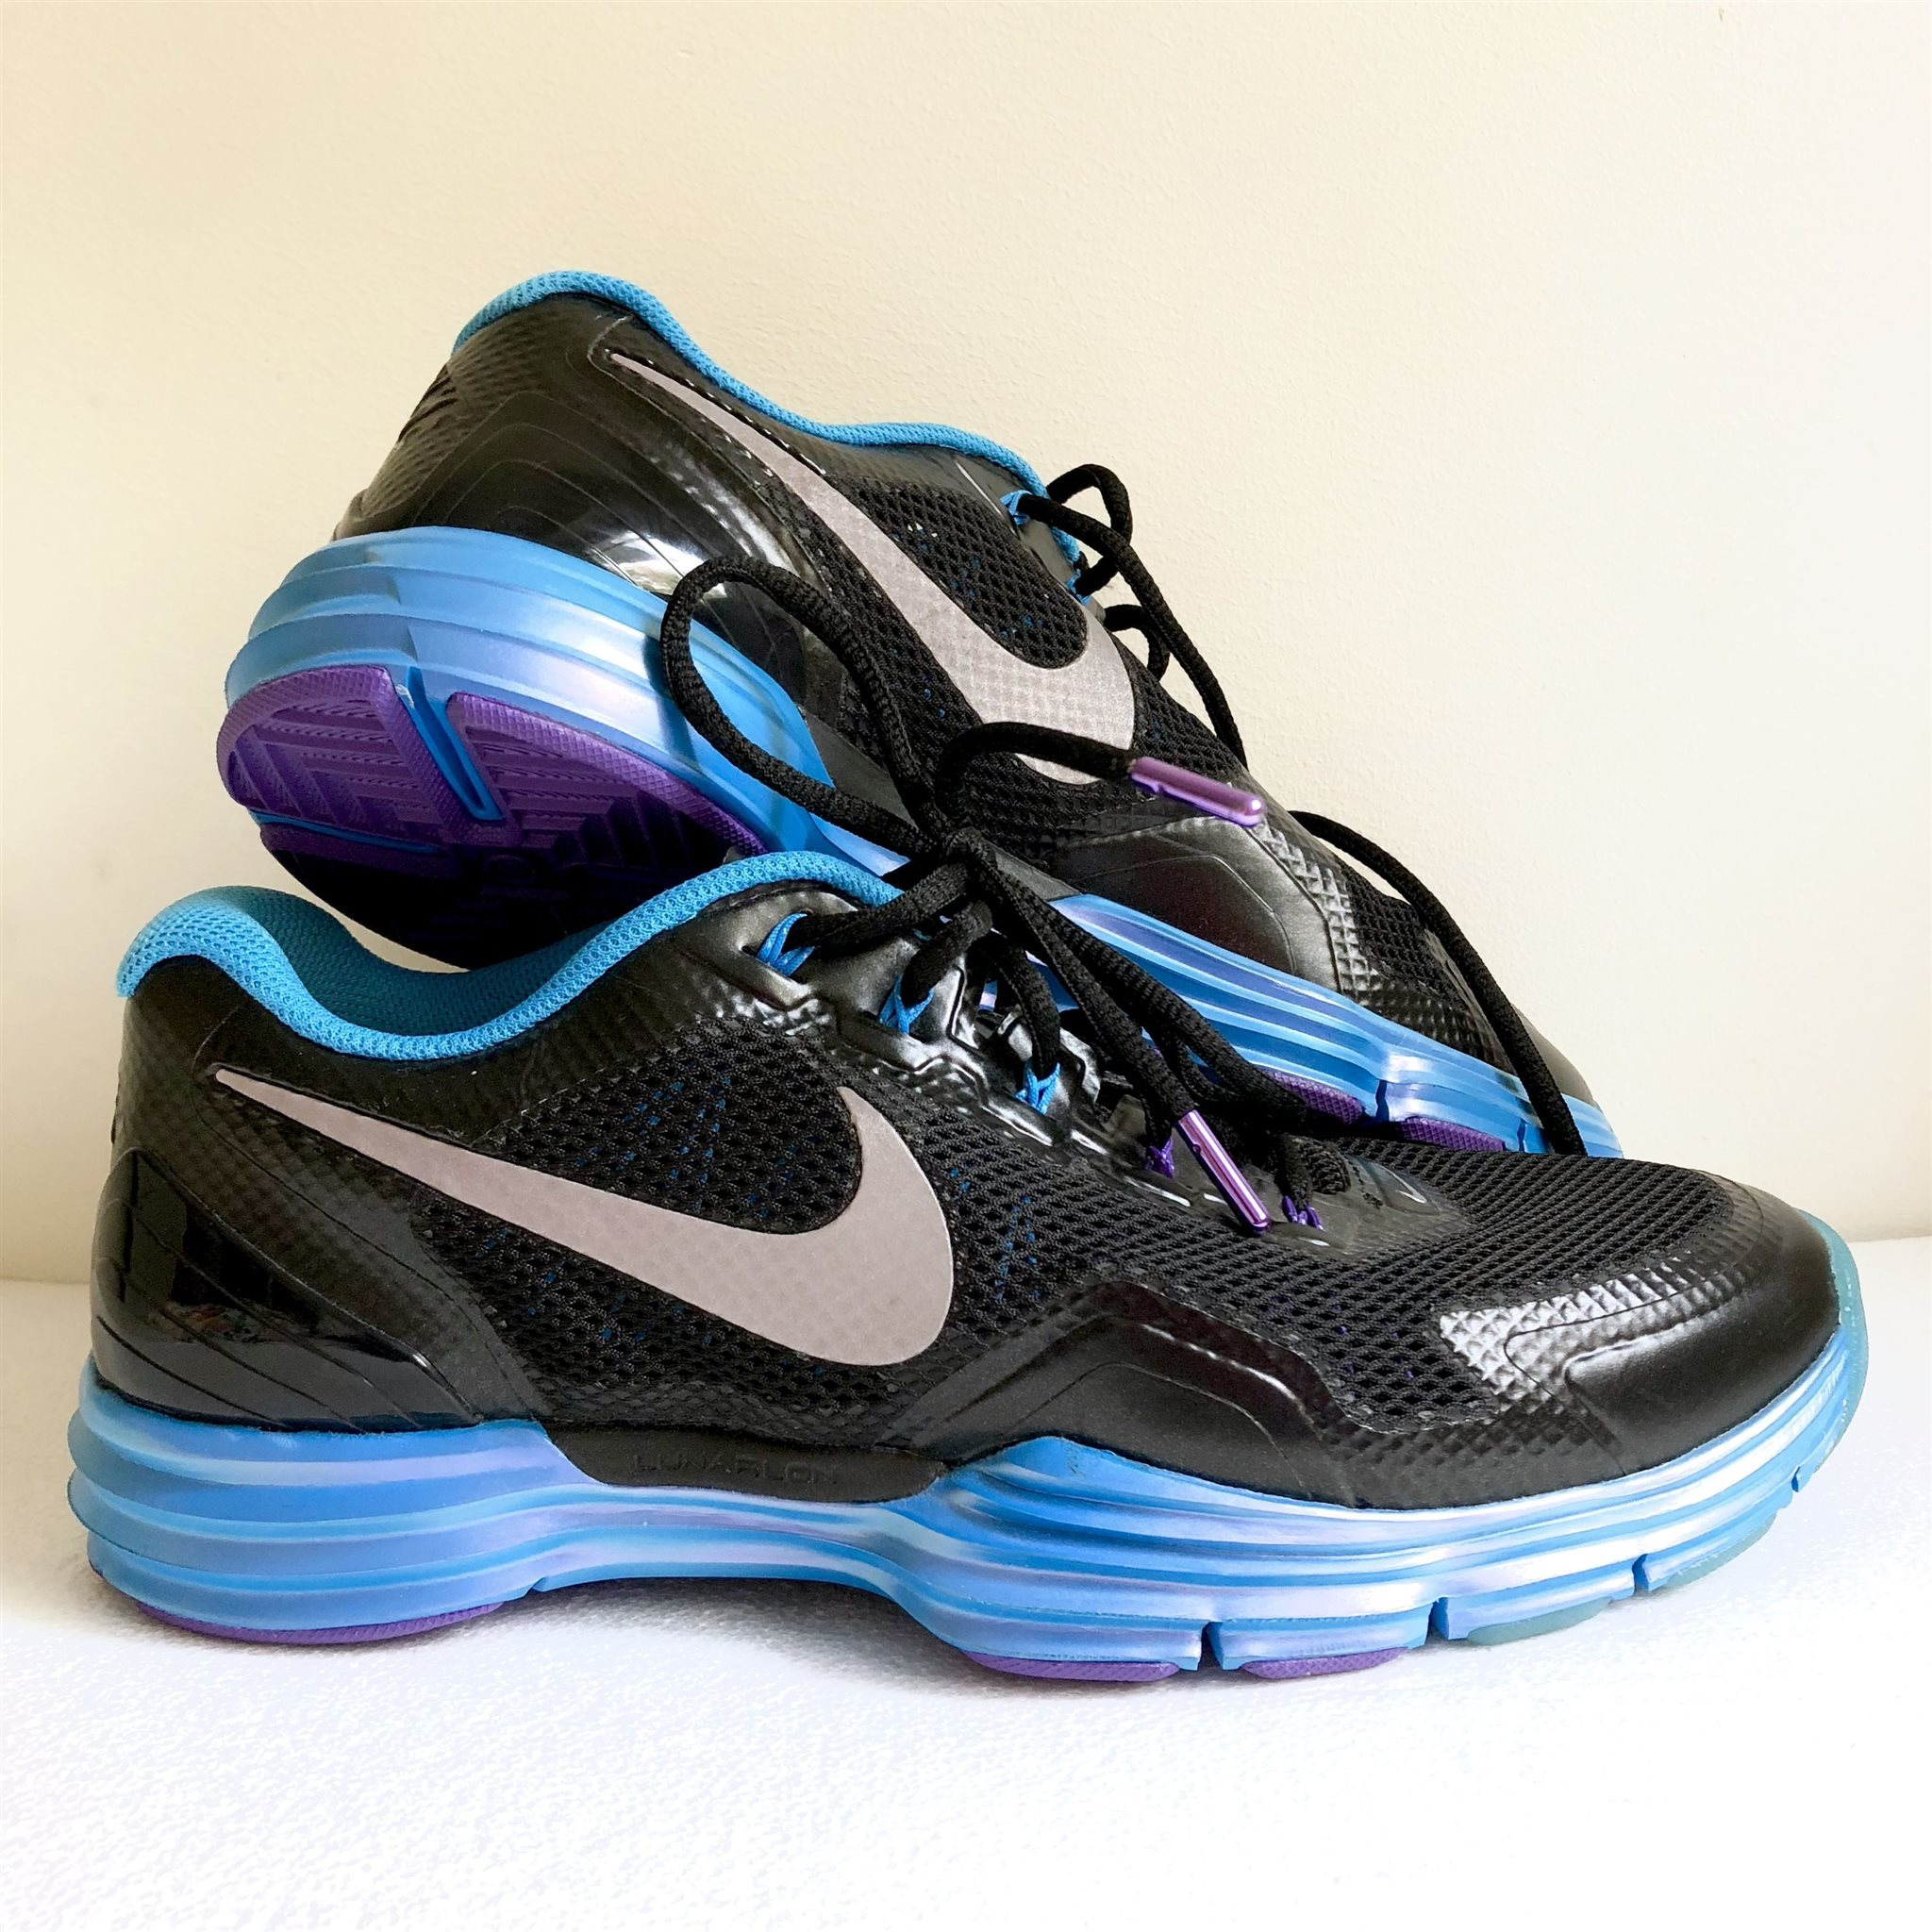 skor träning gym